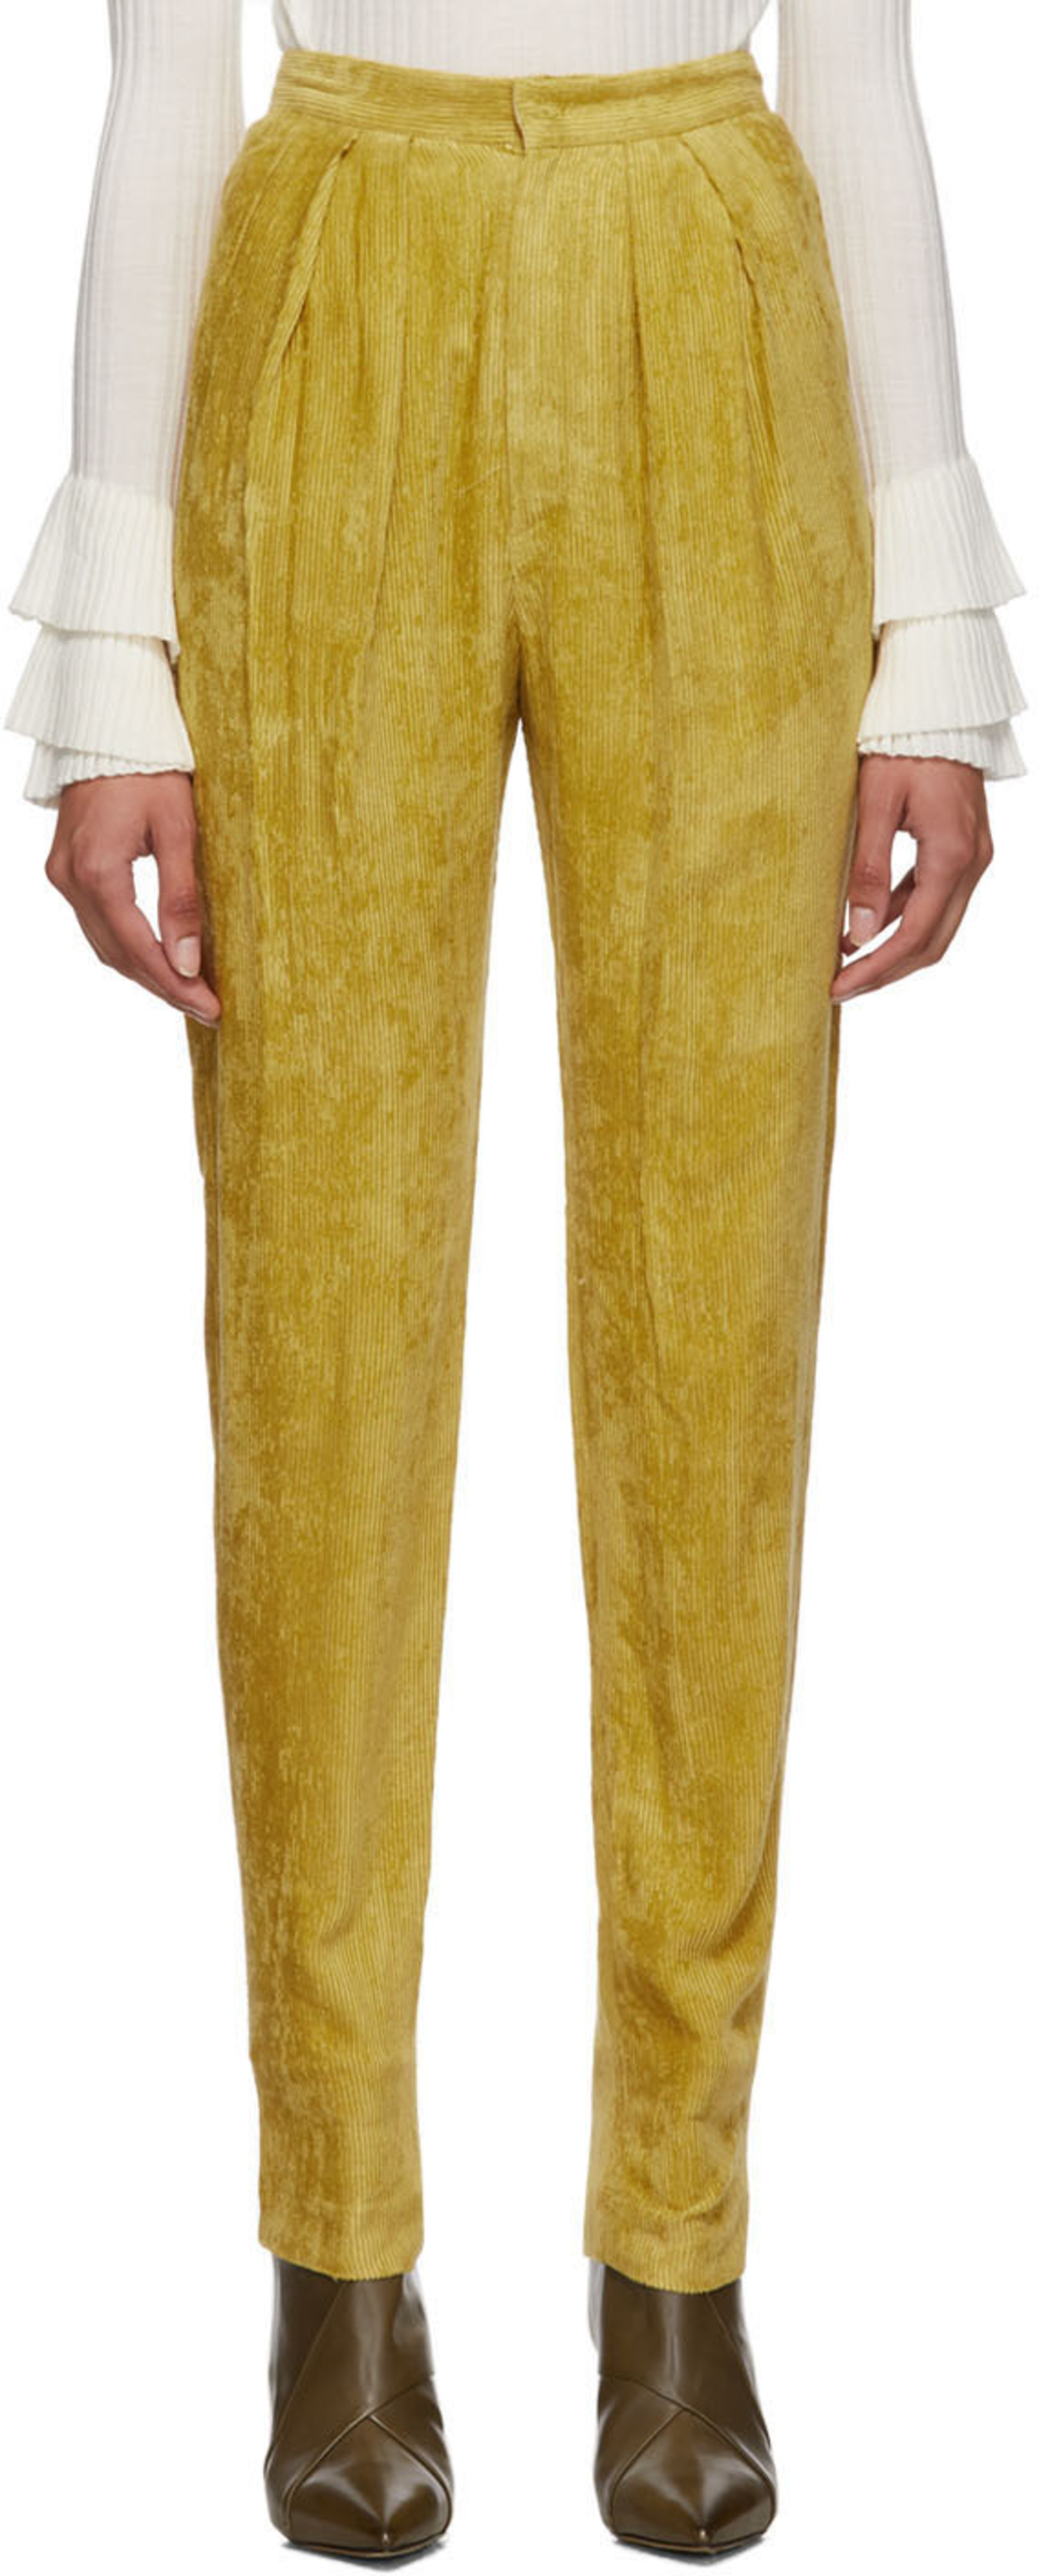 cc422533ebe Yellow Fany Pants